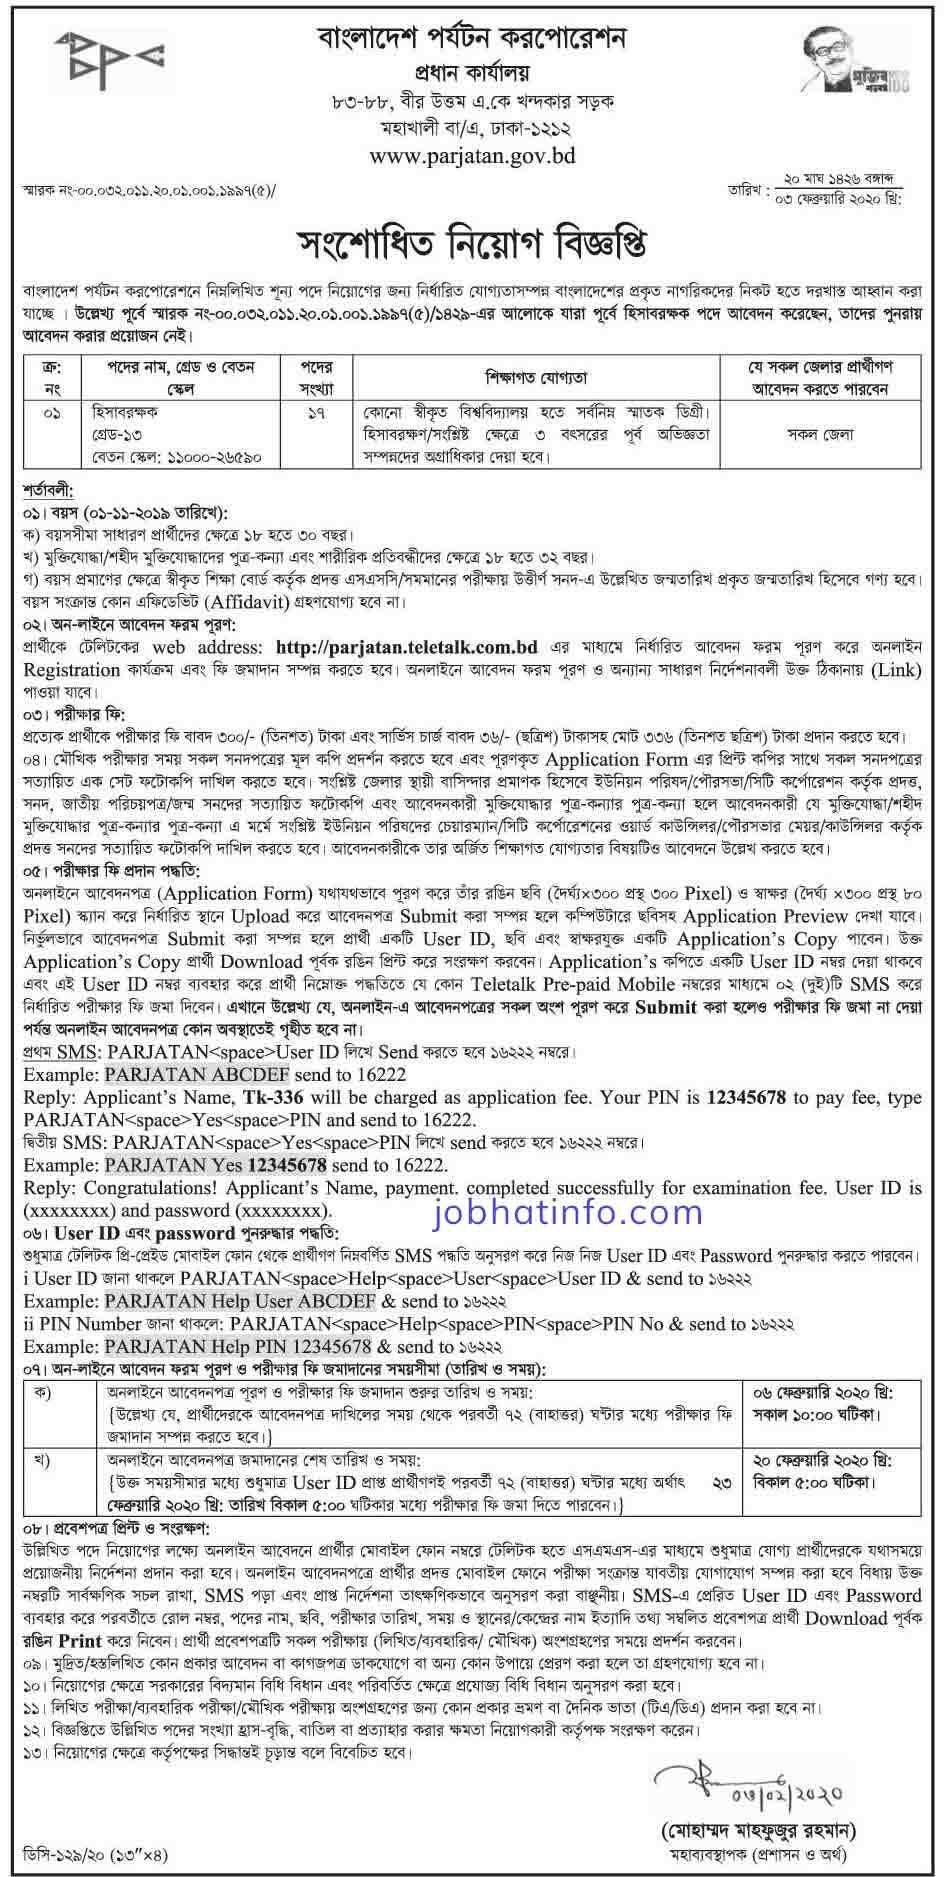 Bangladesh Parjatan Corporation Circular-apply parjatan.teletalk.com.bd 2